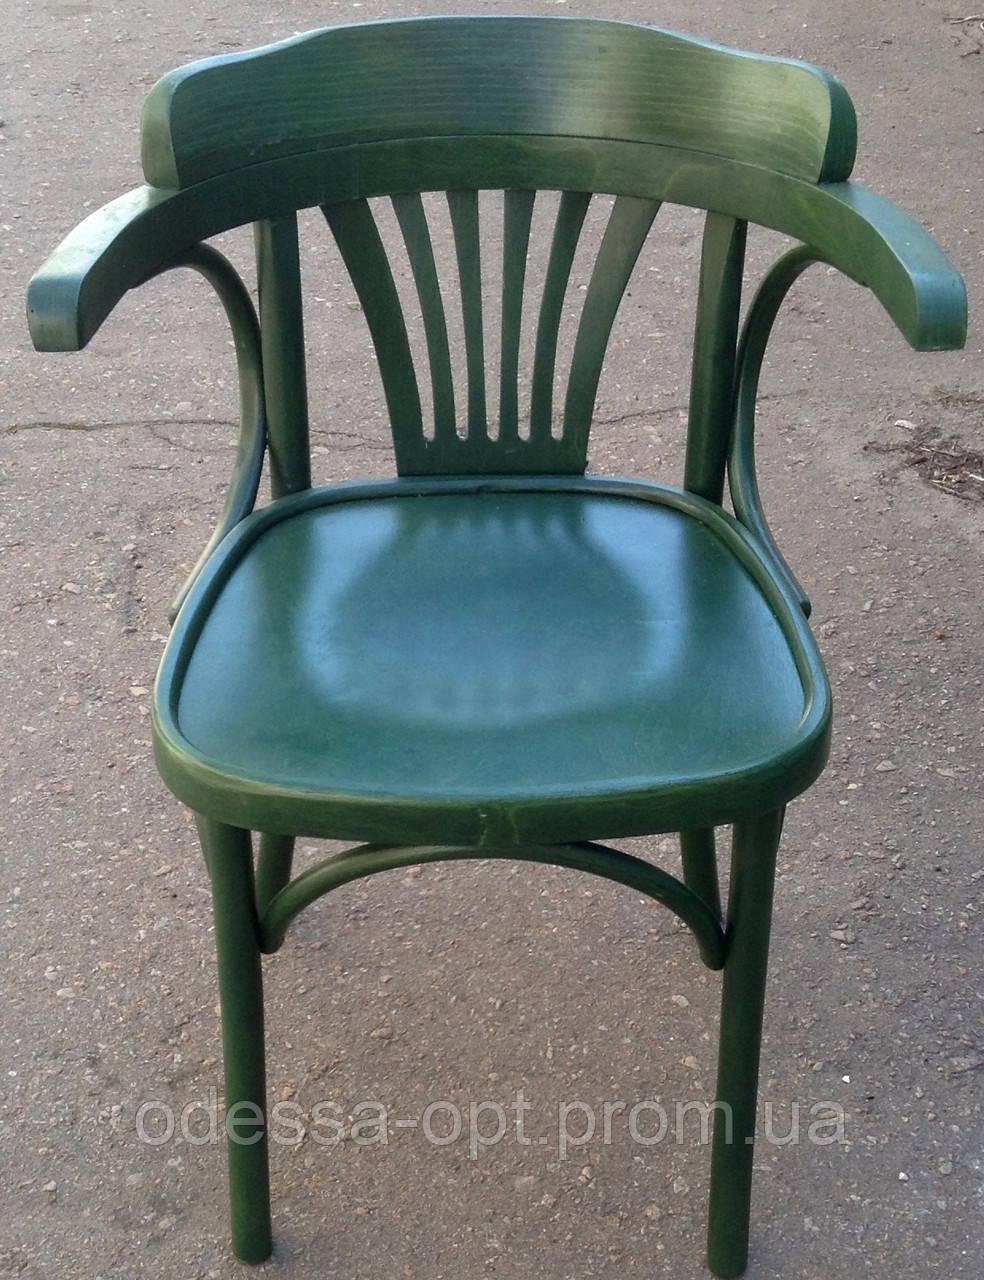 Ирландский стул зеленый